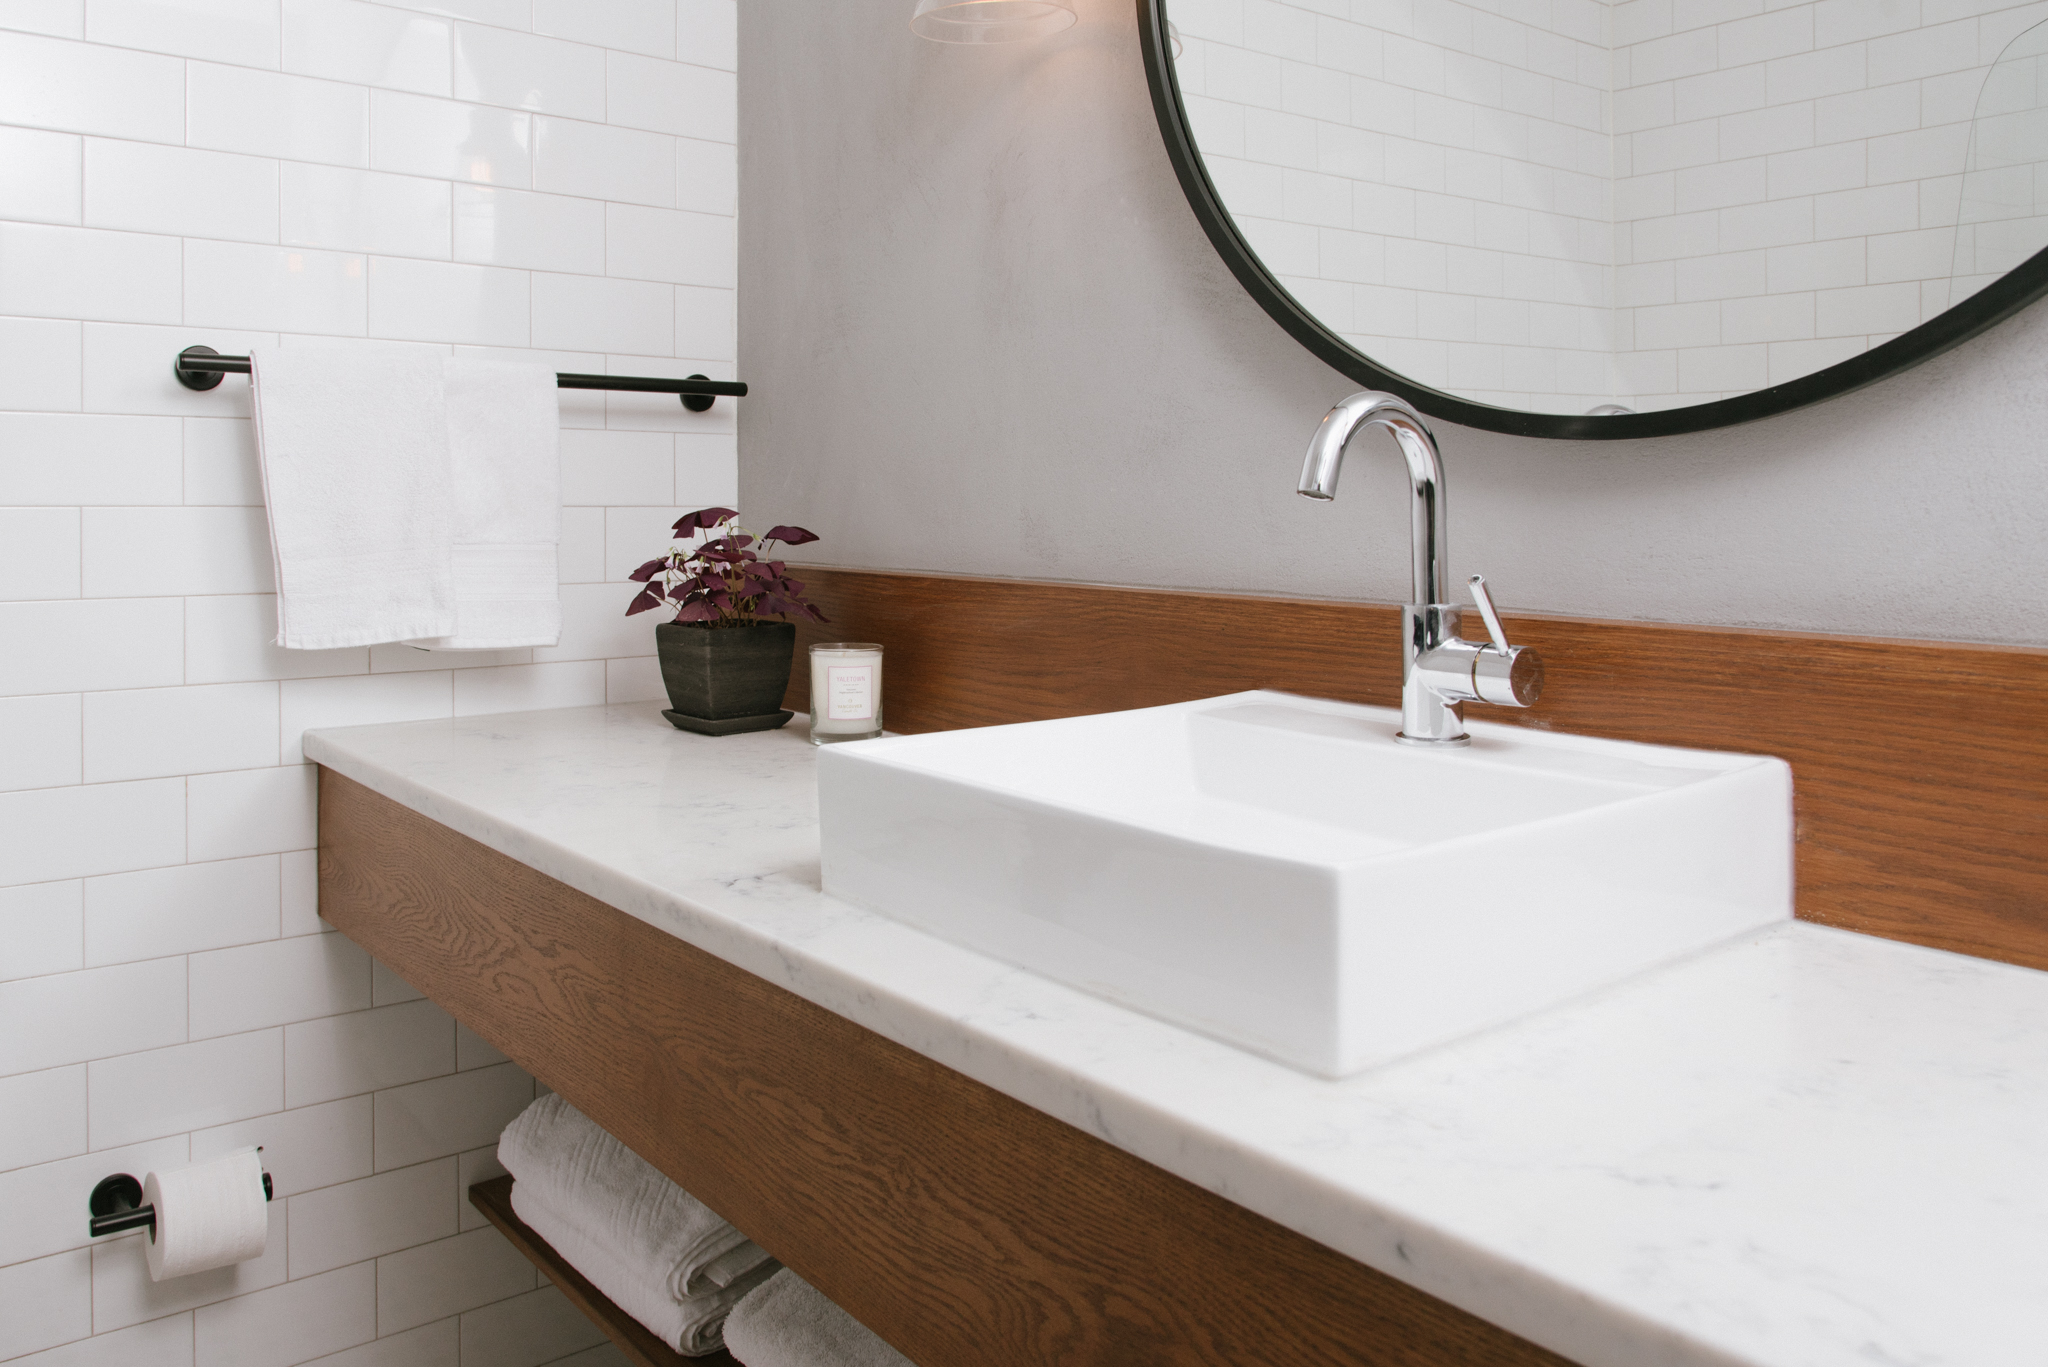 Our McLeod Building client's custom vanity featuring a quartz countertop.